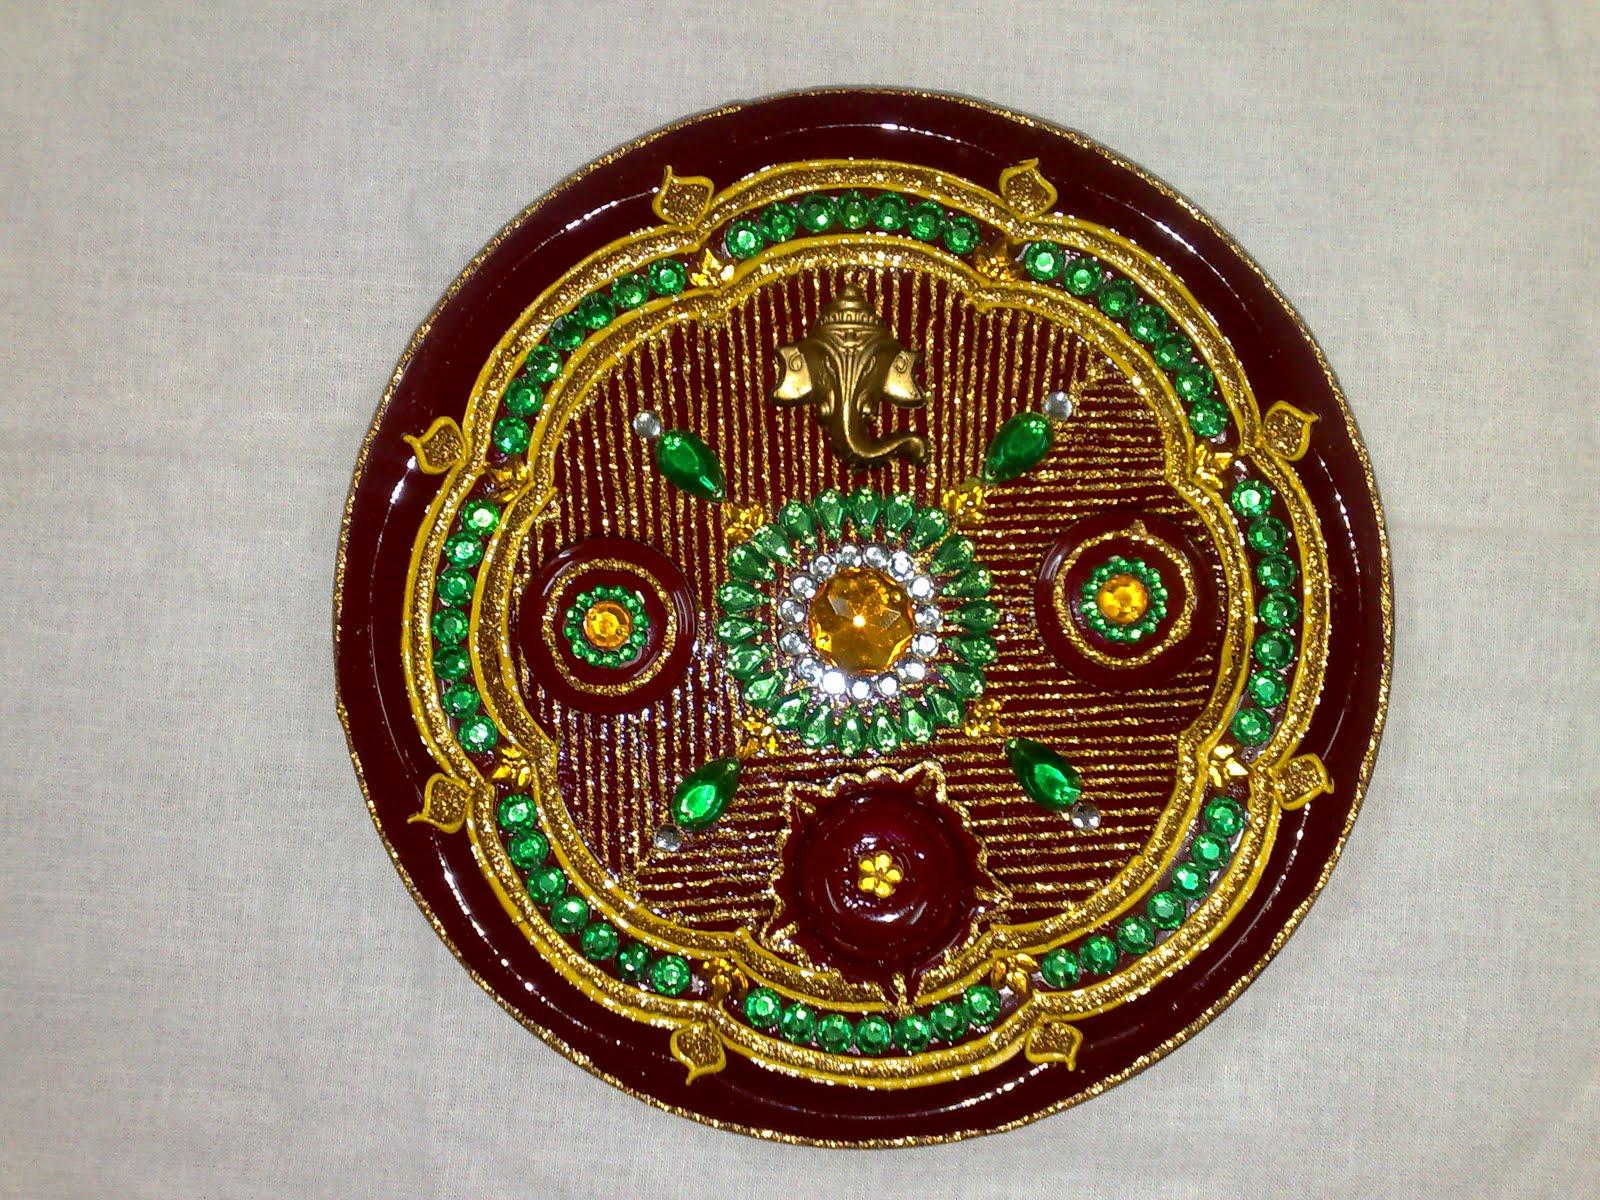 Vaibhavi creations rakhi thali aarti thai decorative thali wedding rakhi thali aarti thai decorative thali wedding thali pooja thali junglespirit Choice Image